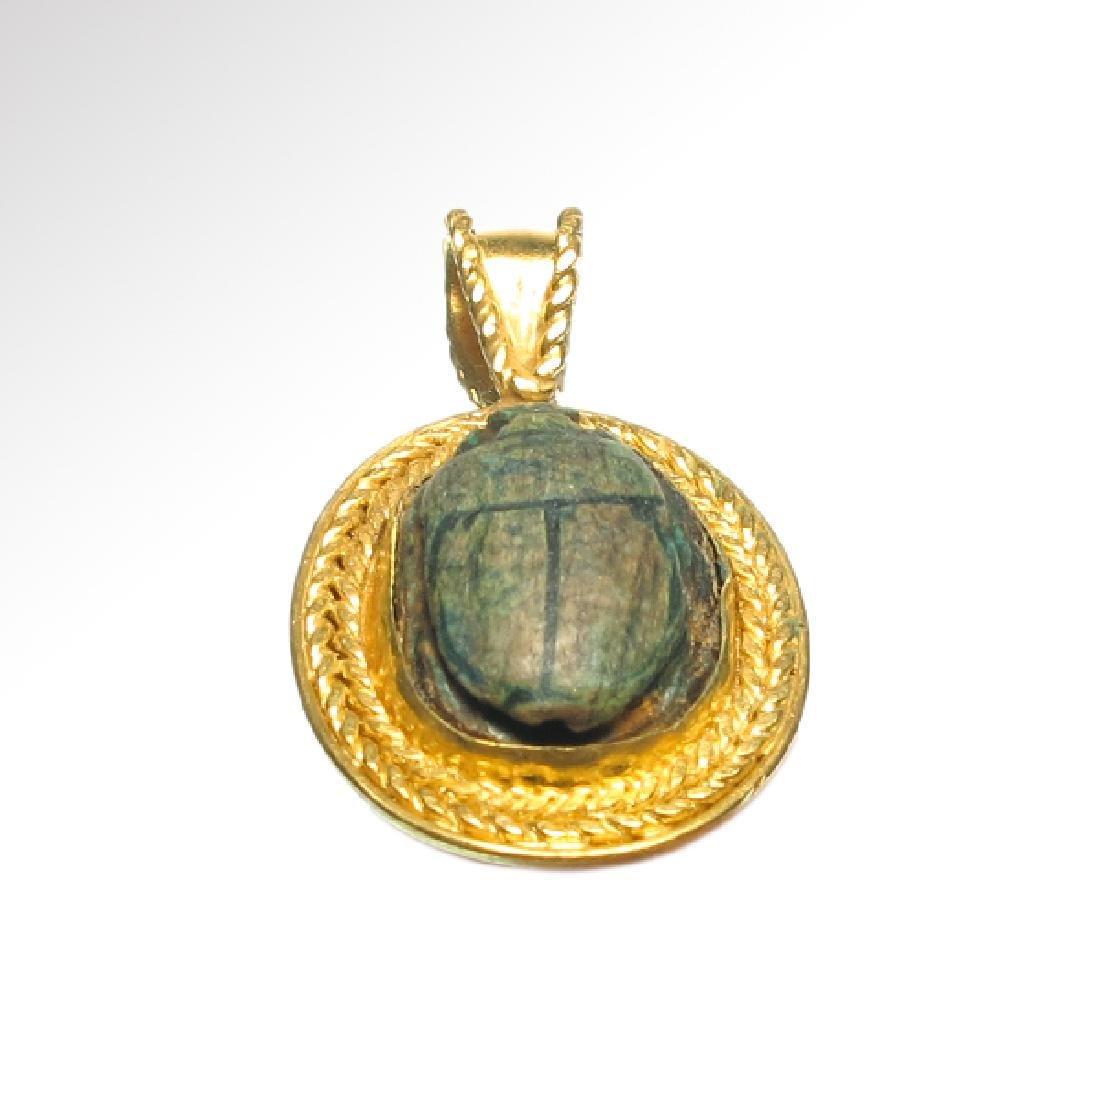 Egyptian Good Wish Scarab Ankh 18k Modern Gold Pendant - 6